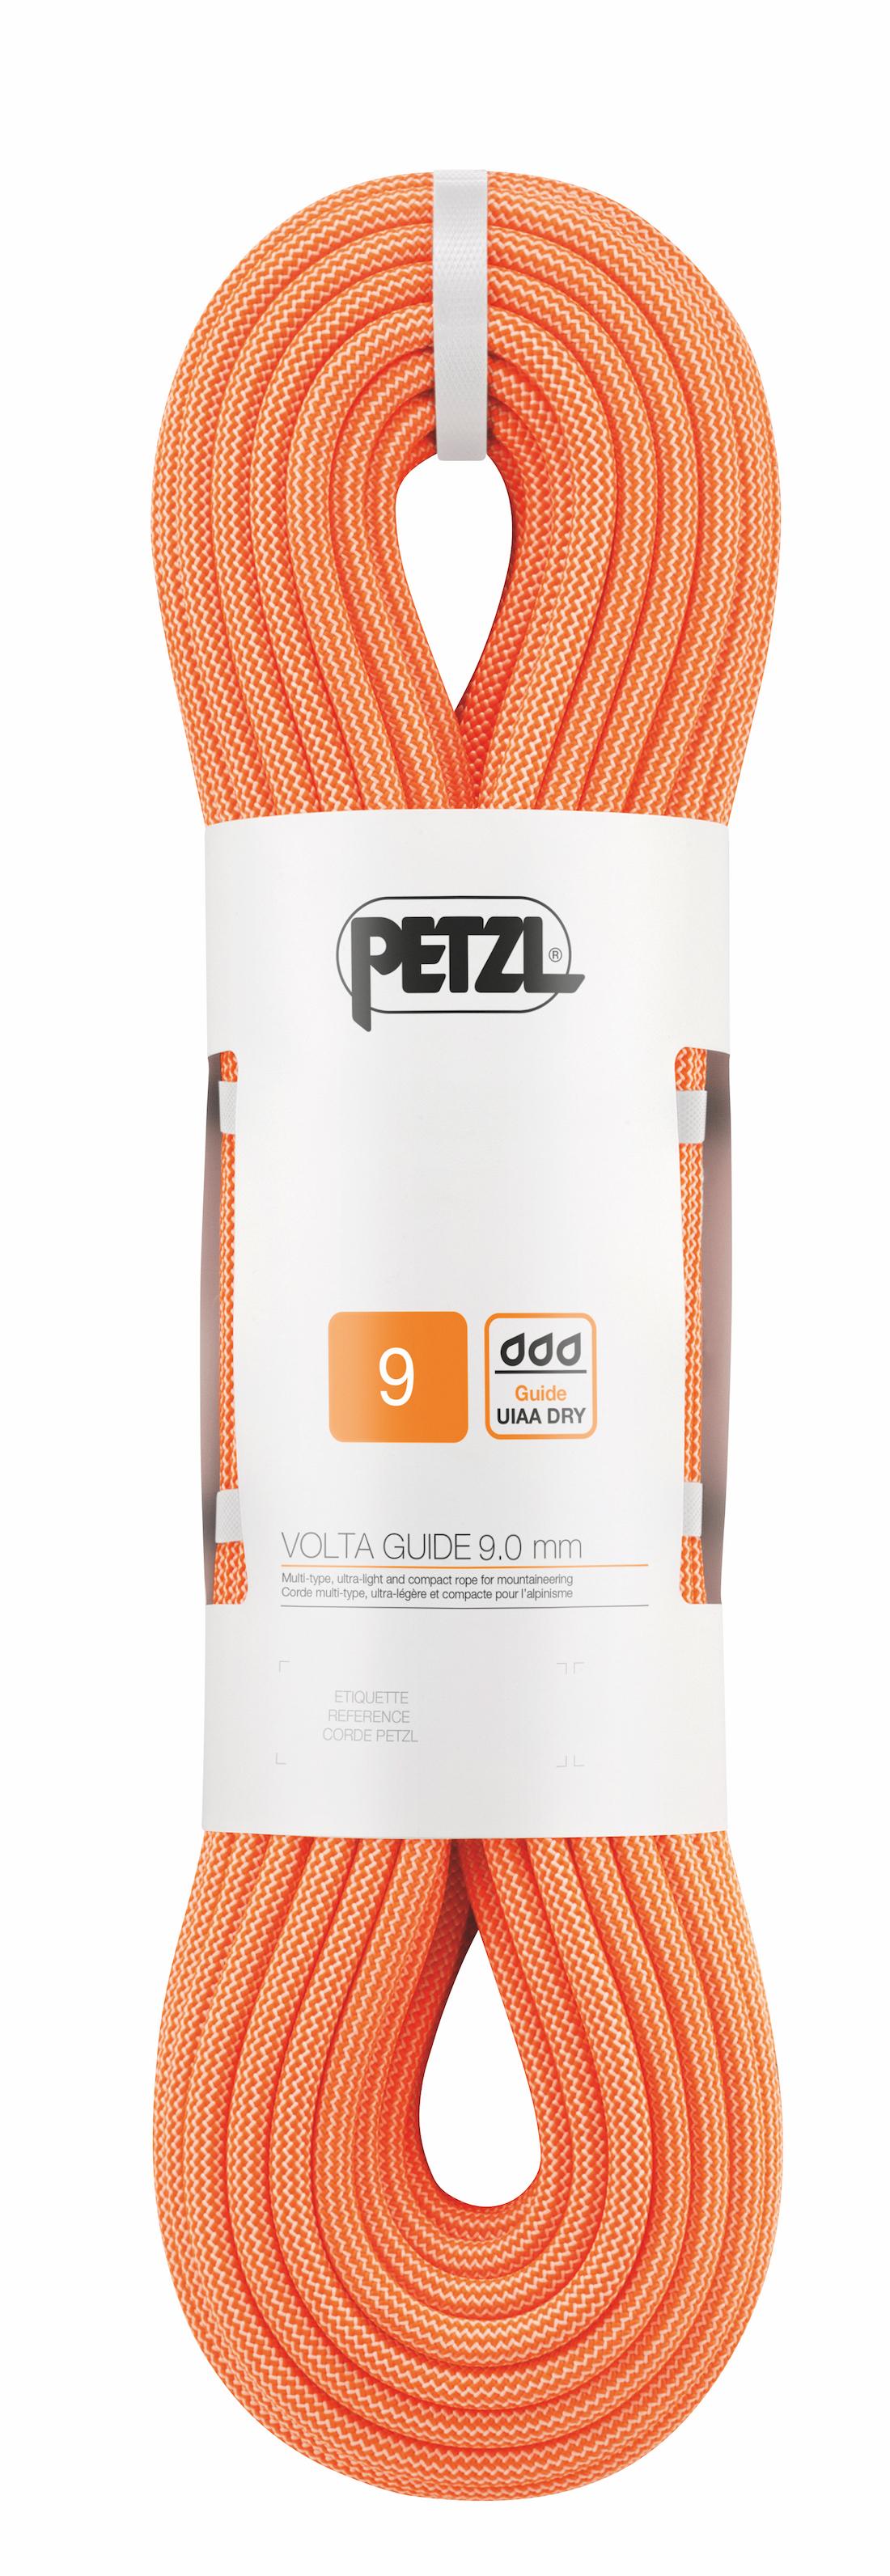 Petzl - Volta Guide 9 mm - Climbing Rope